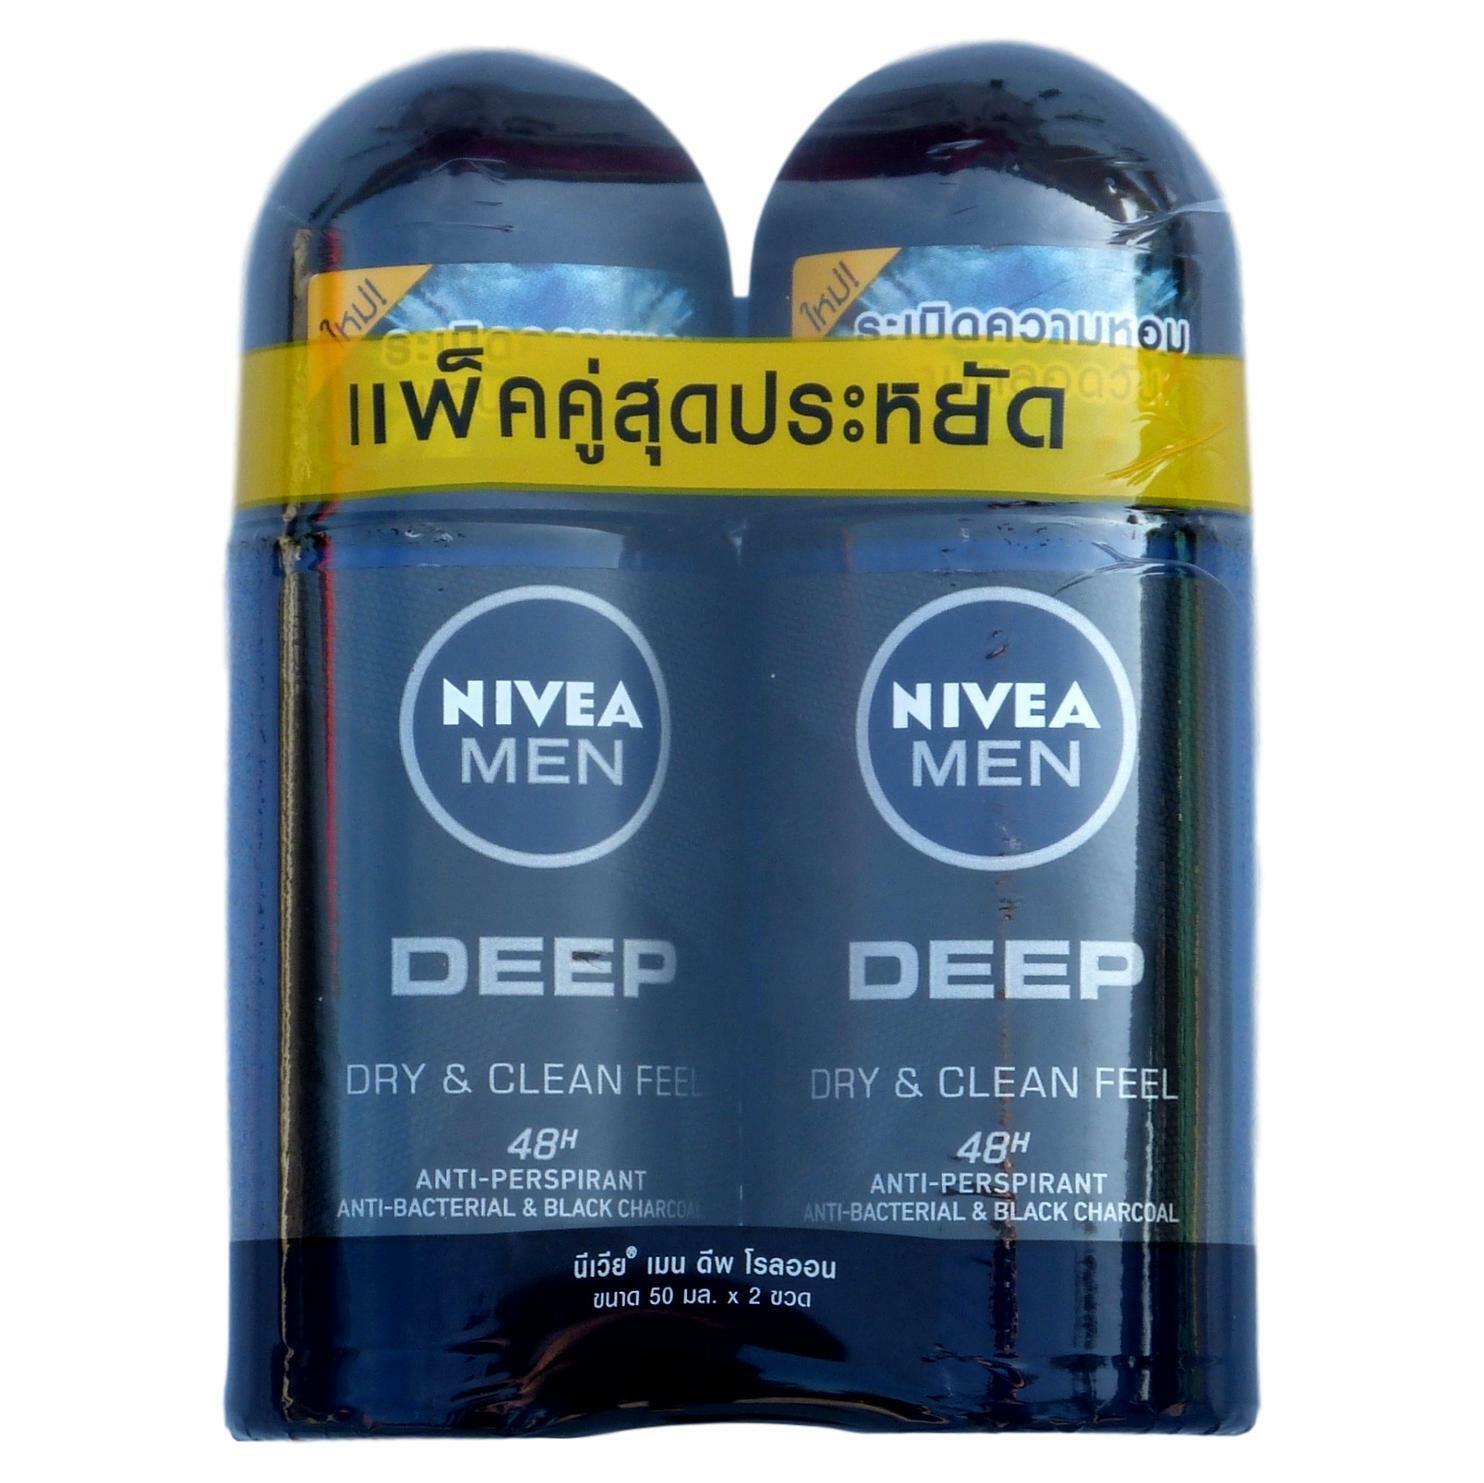 Nivea Men Deep Dry and Clean Deodorant Antiperspirant Roll On 50ml Pack of 2